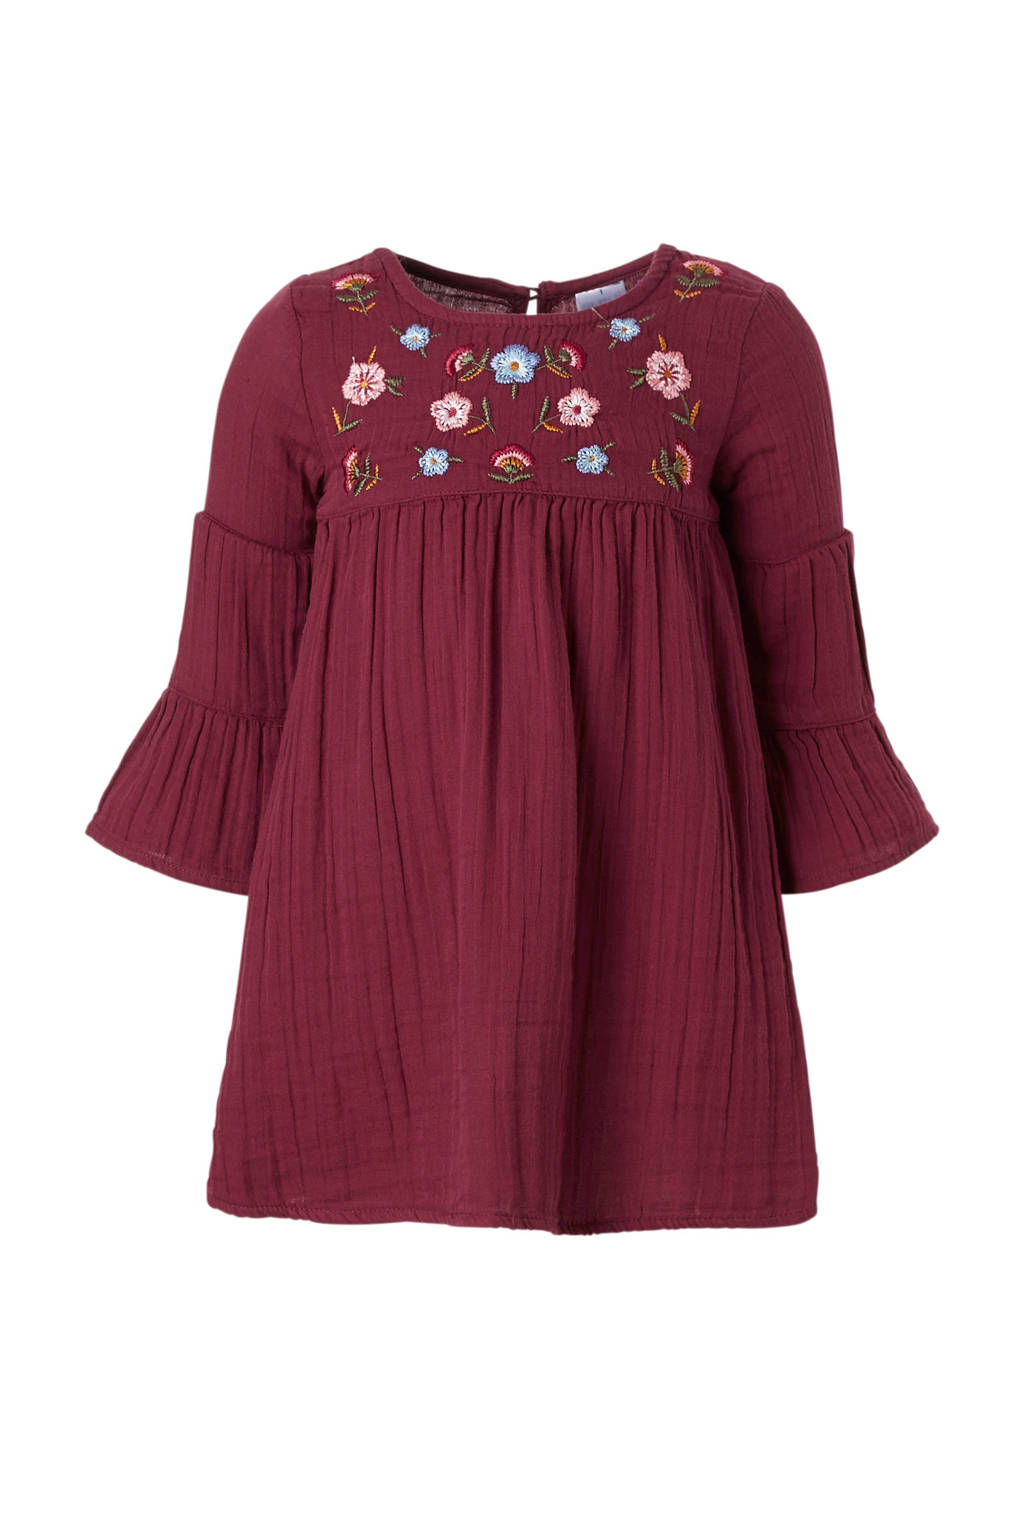 C&A Palomino jurk met bloemenborduursels rood, Donkerrood